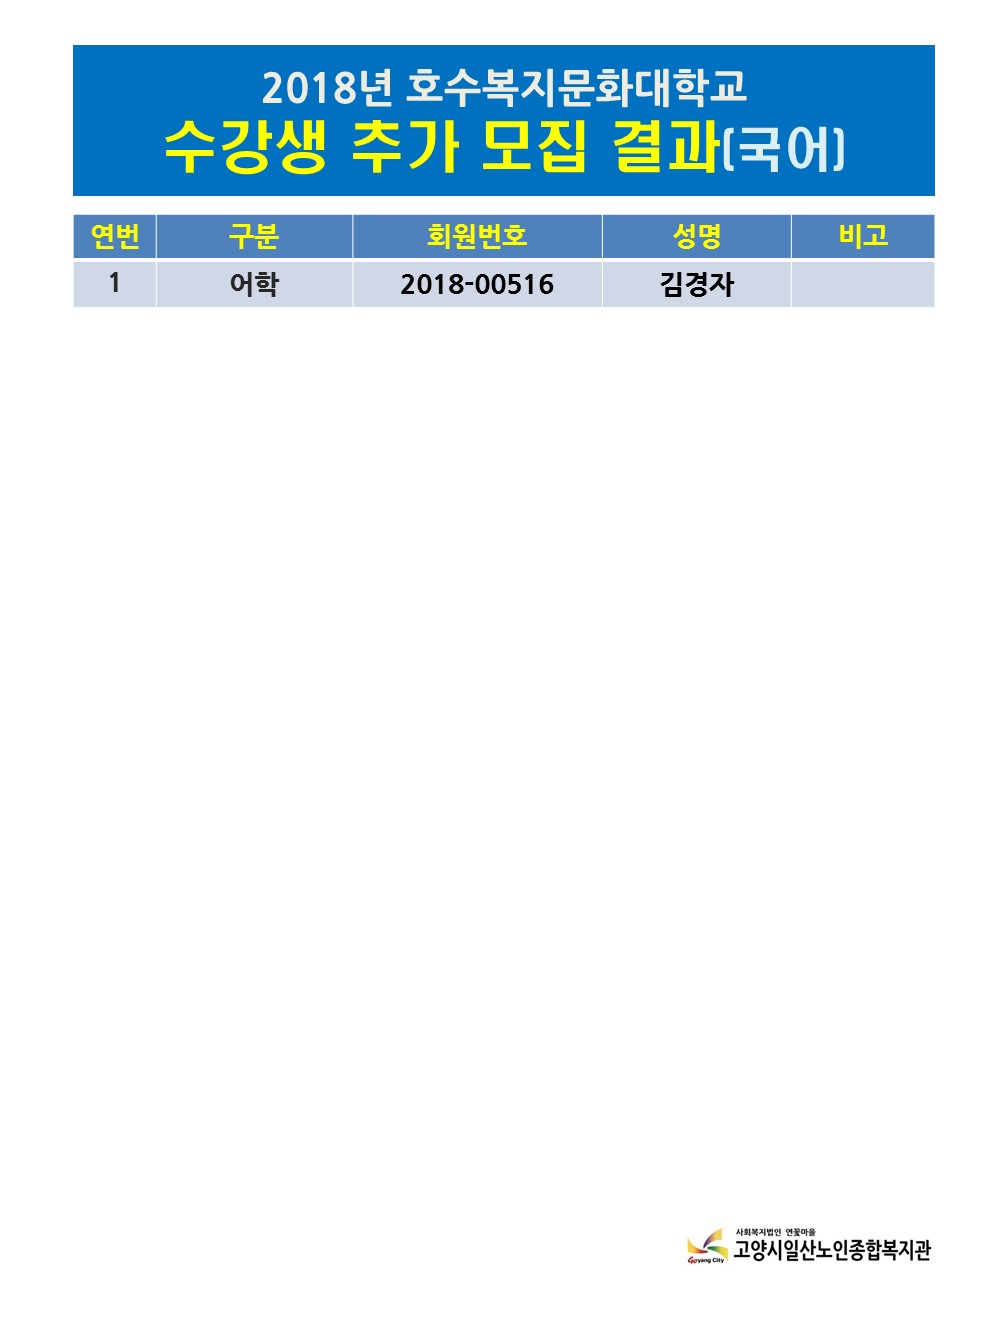 ffcb03e868cd9d87a02a4afb17f56e40_1529539397_9937.JPG